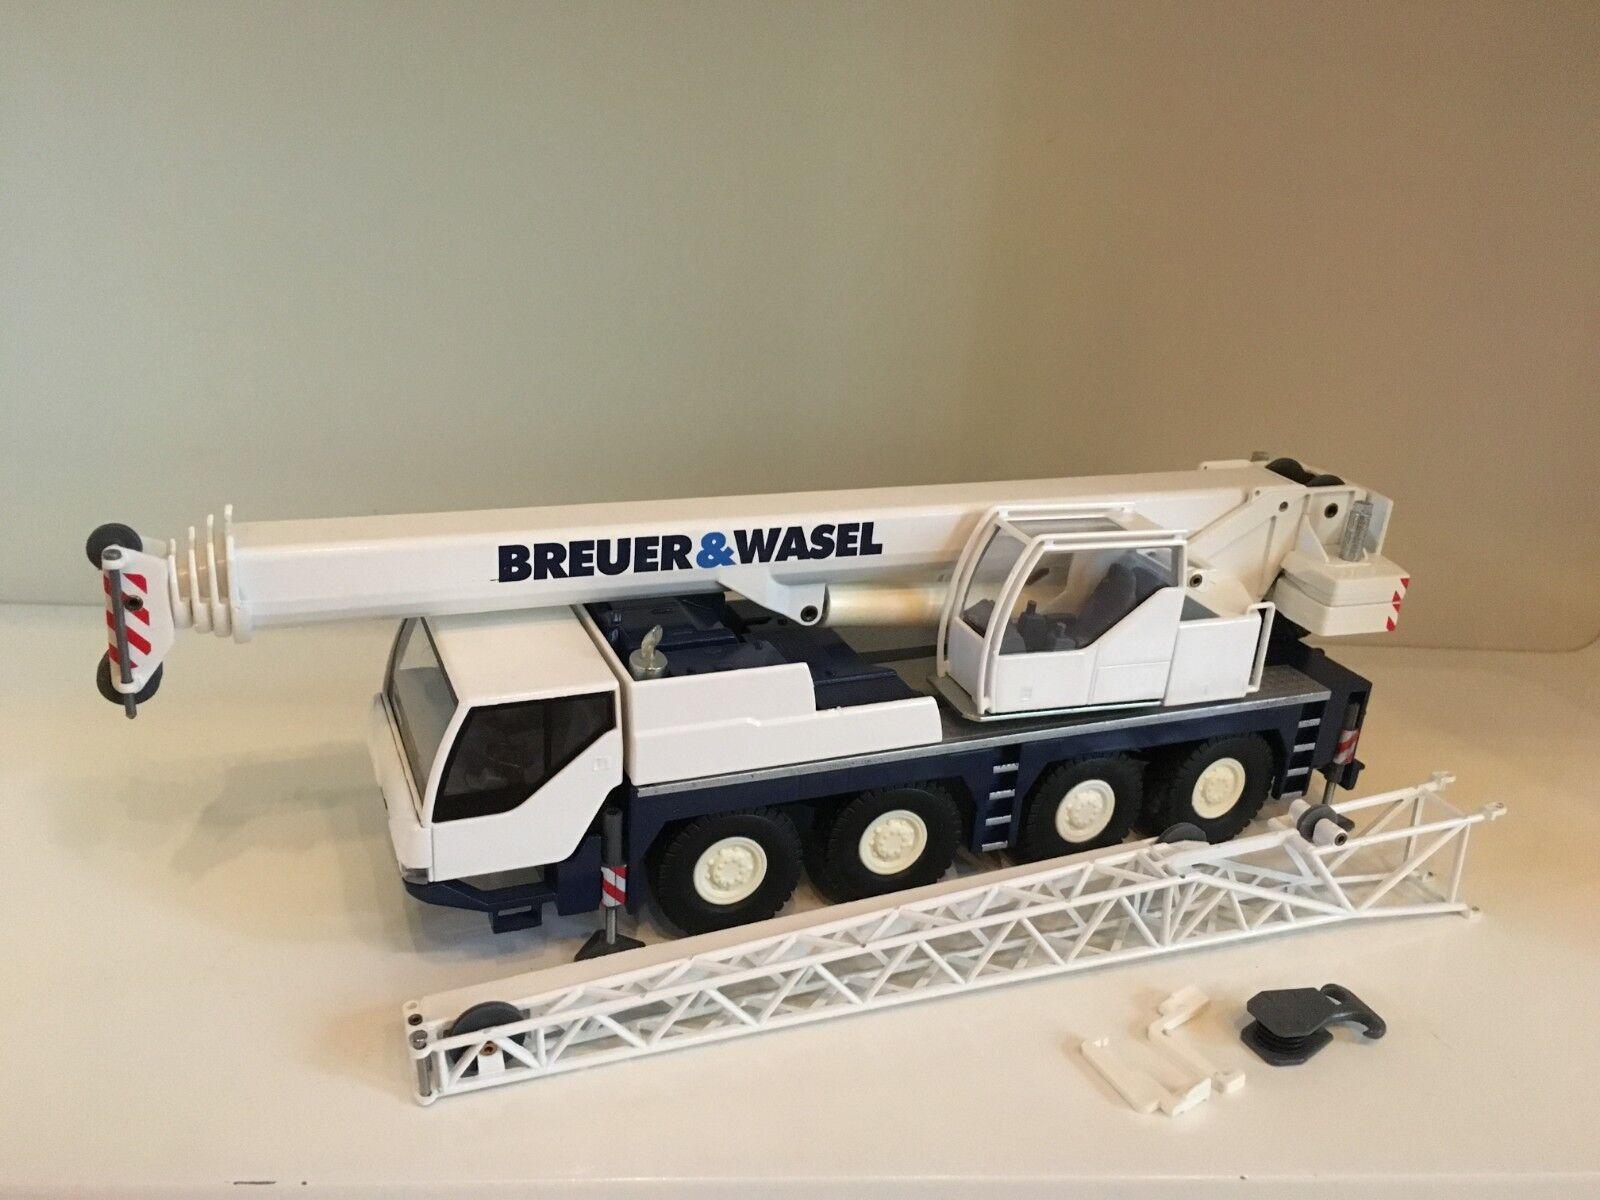 Liebherr LTM 1060 2 grue mobile  BREUER & WASEL  de Conrad 2094 1 50